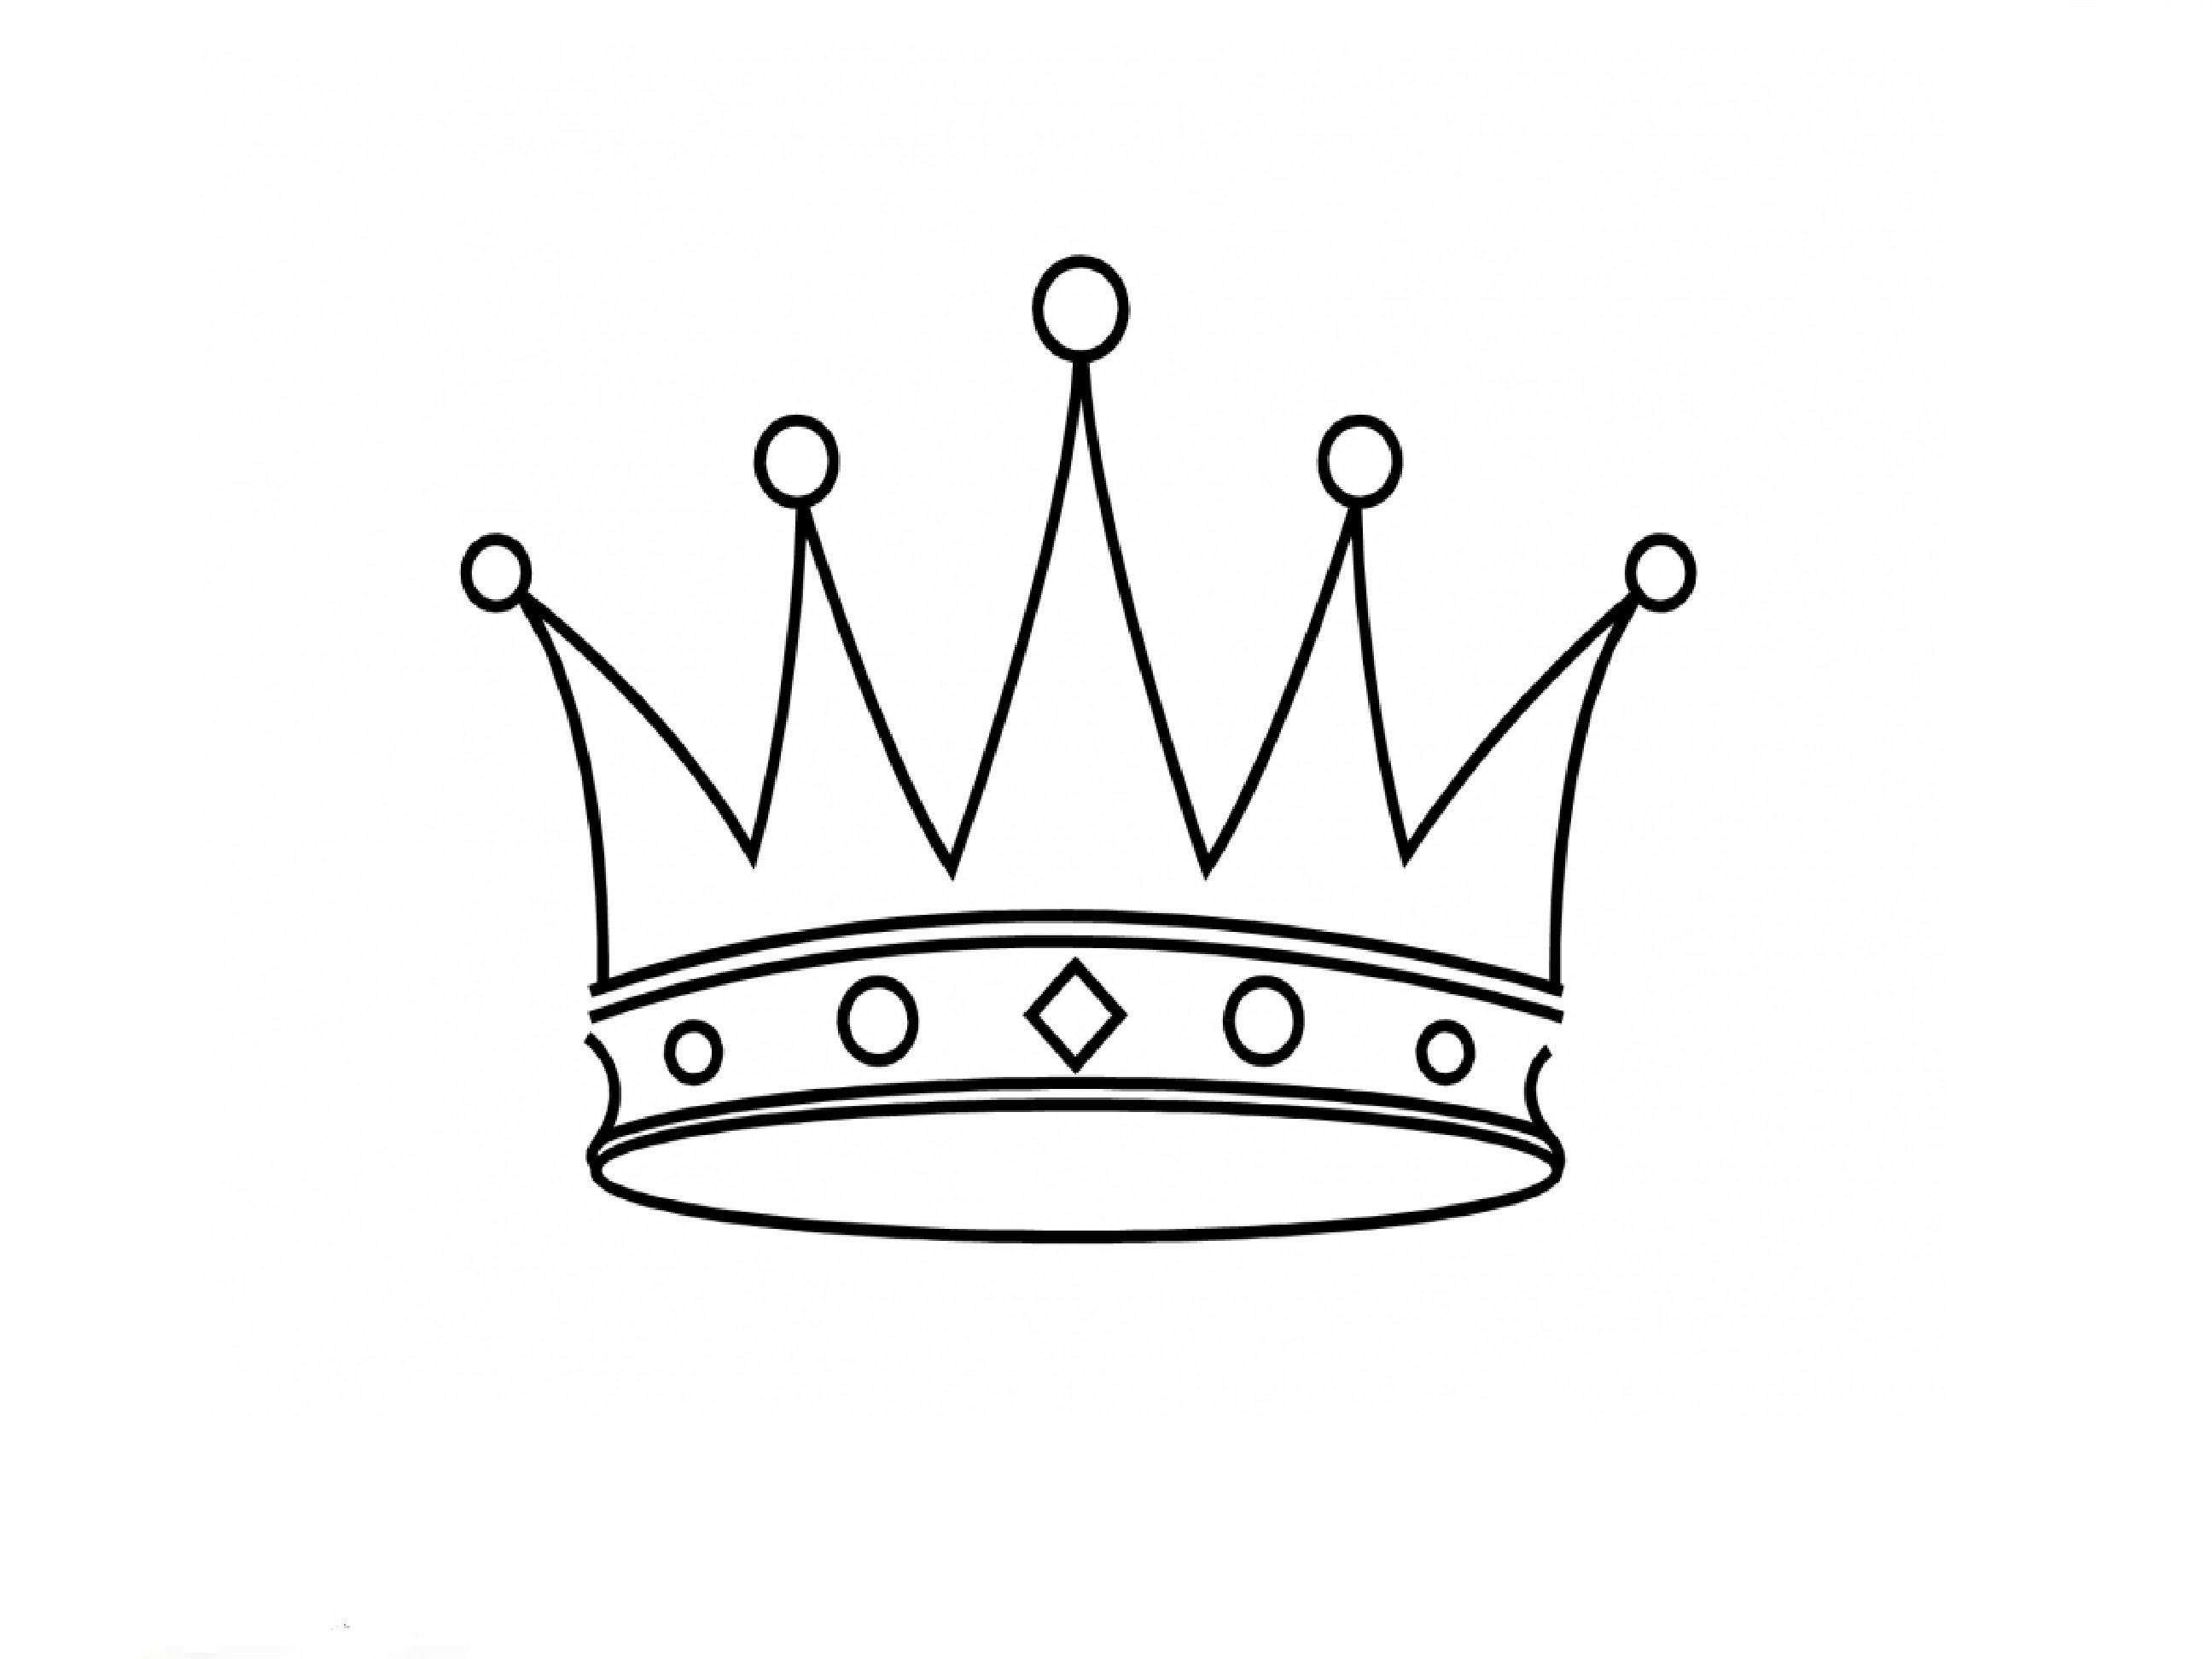 Princess Crown Drawing At Getdrawings